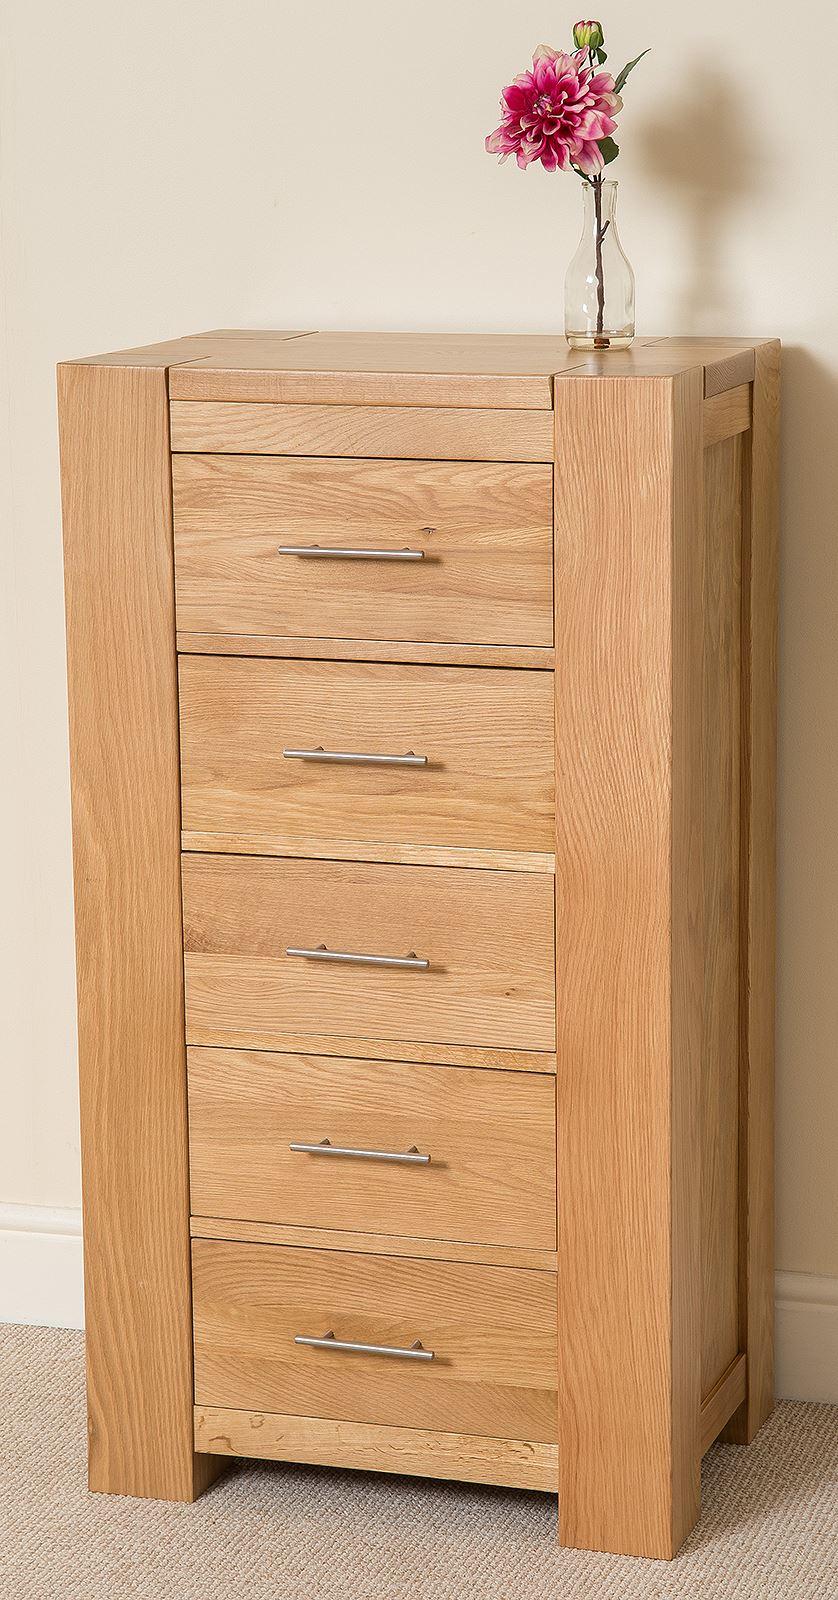 Oak Wood Chest Of Drawers ~ Kuba chunky solid oak wood drawer tallboy chest of